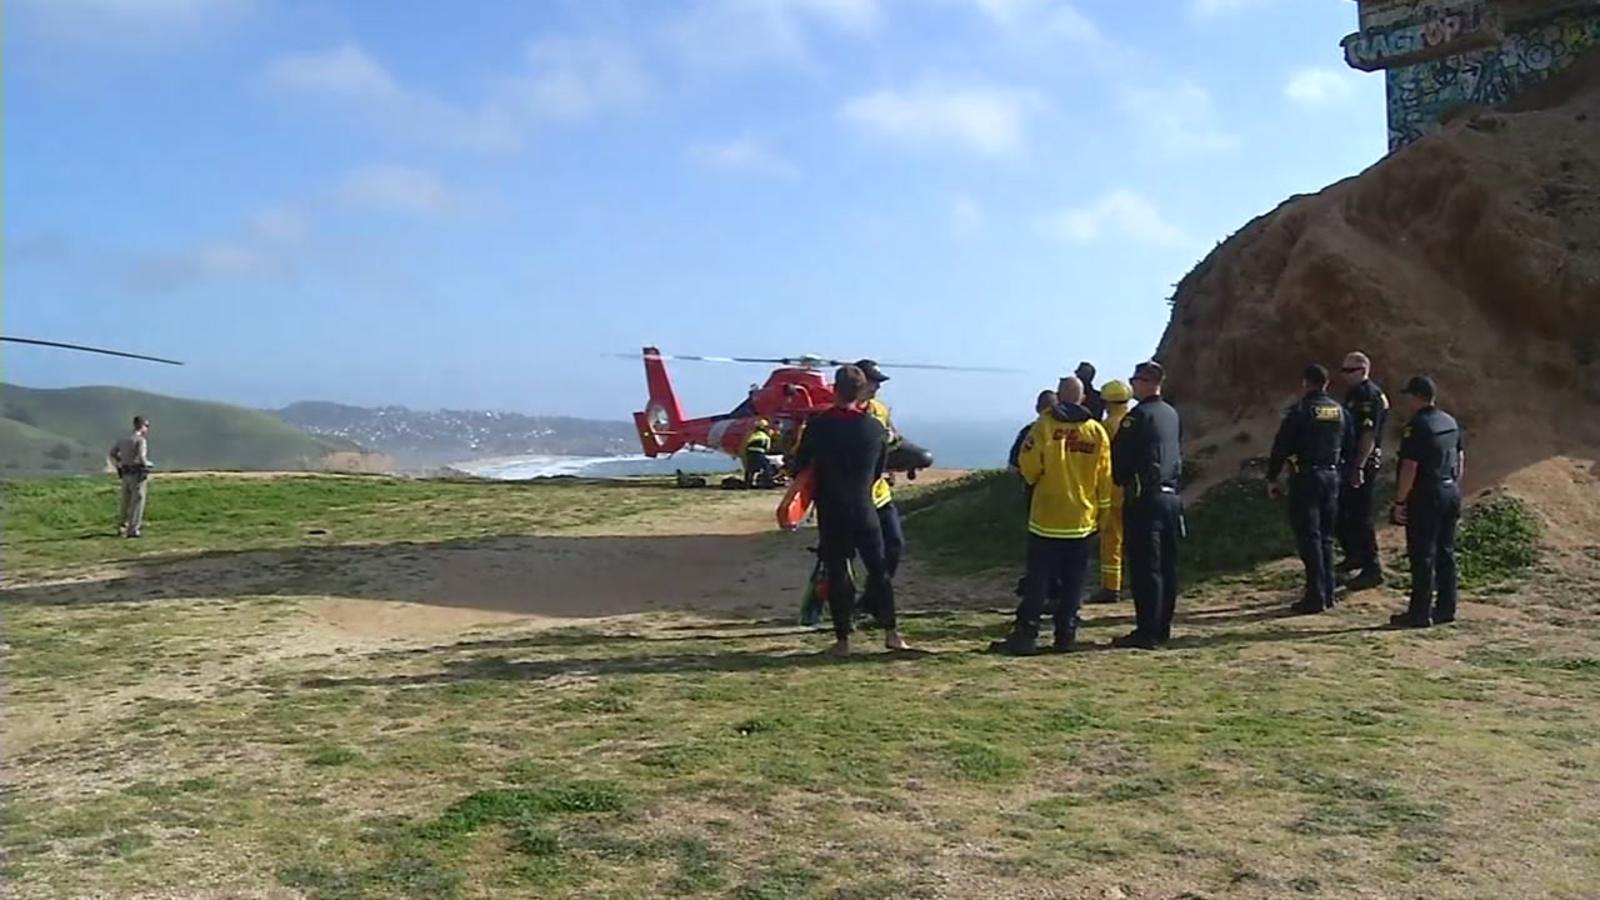 San Francisco man dies after crashing into Pacific Ocean while hang gliding